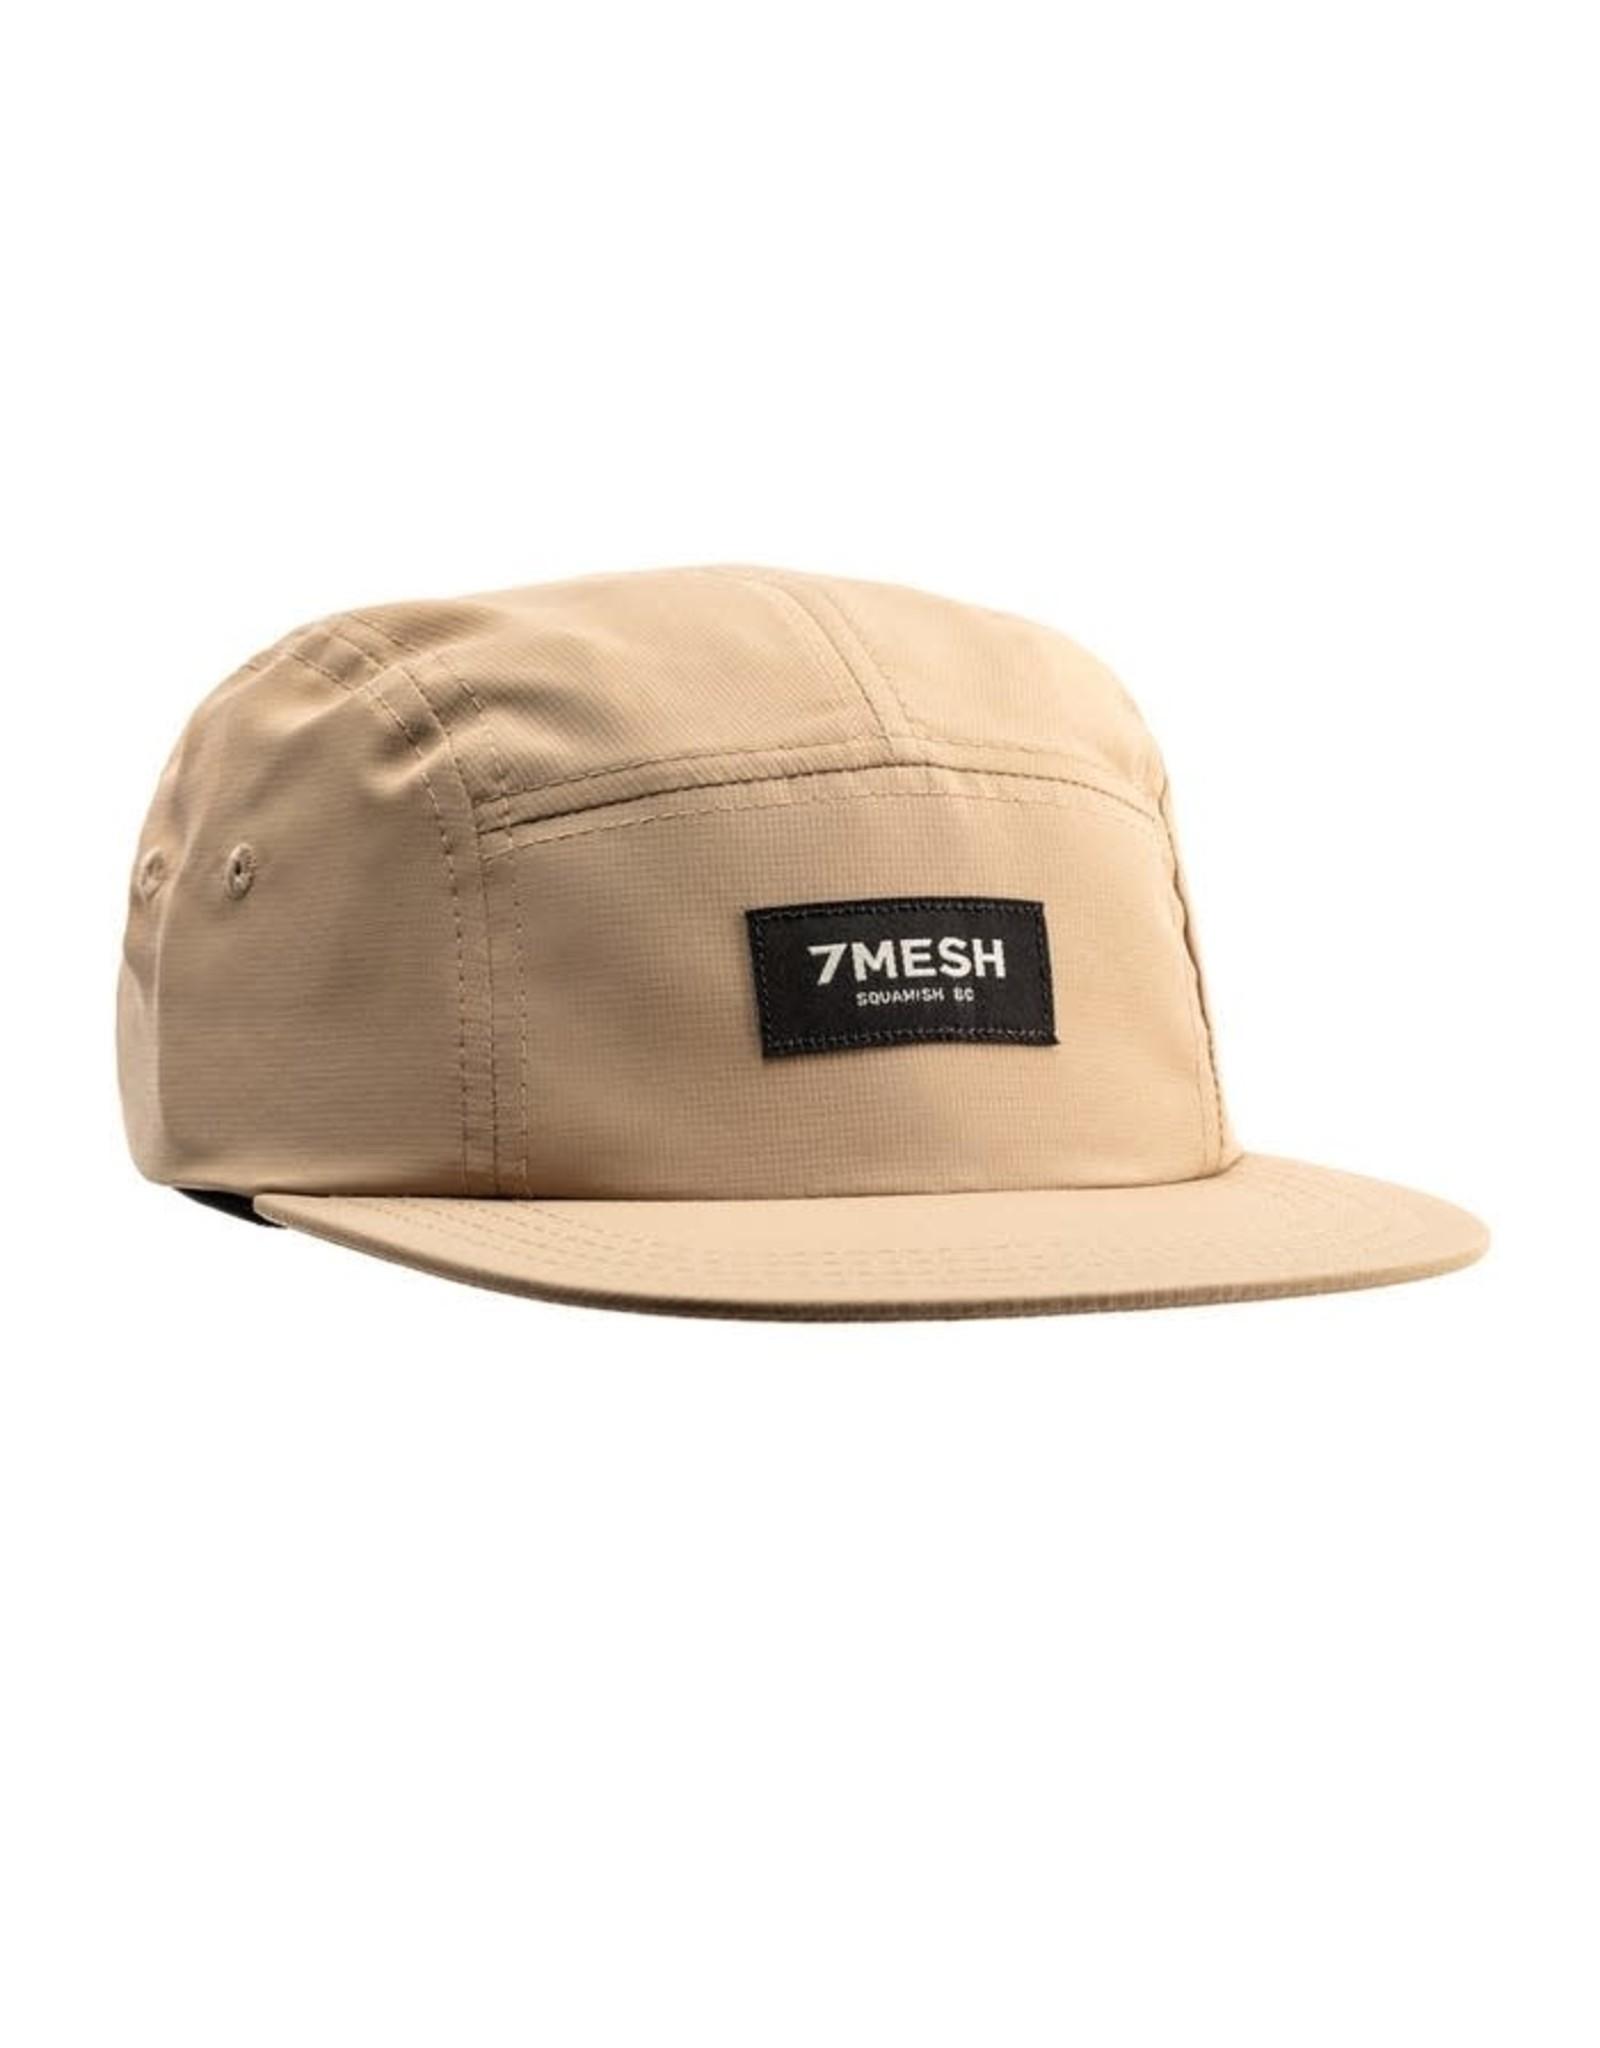 7MESH 7MESH - Trailside Hat Caribou